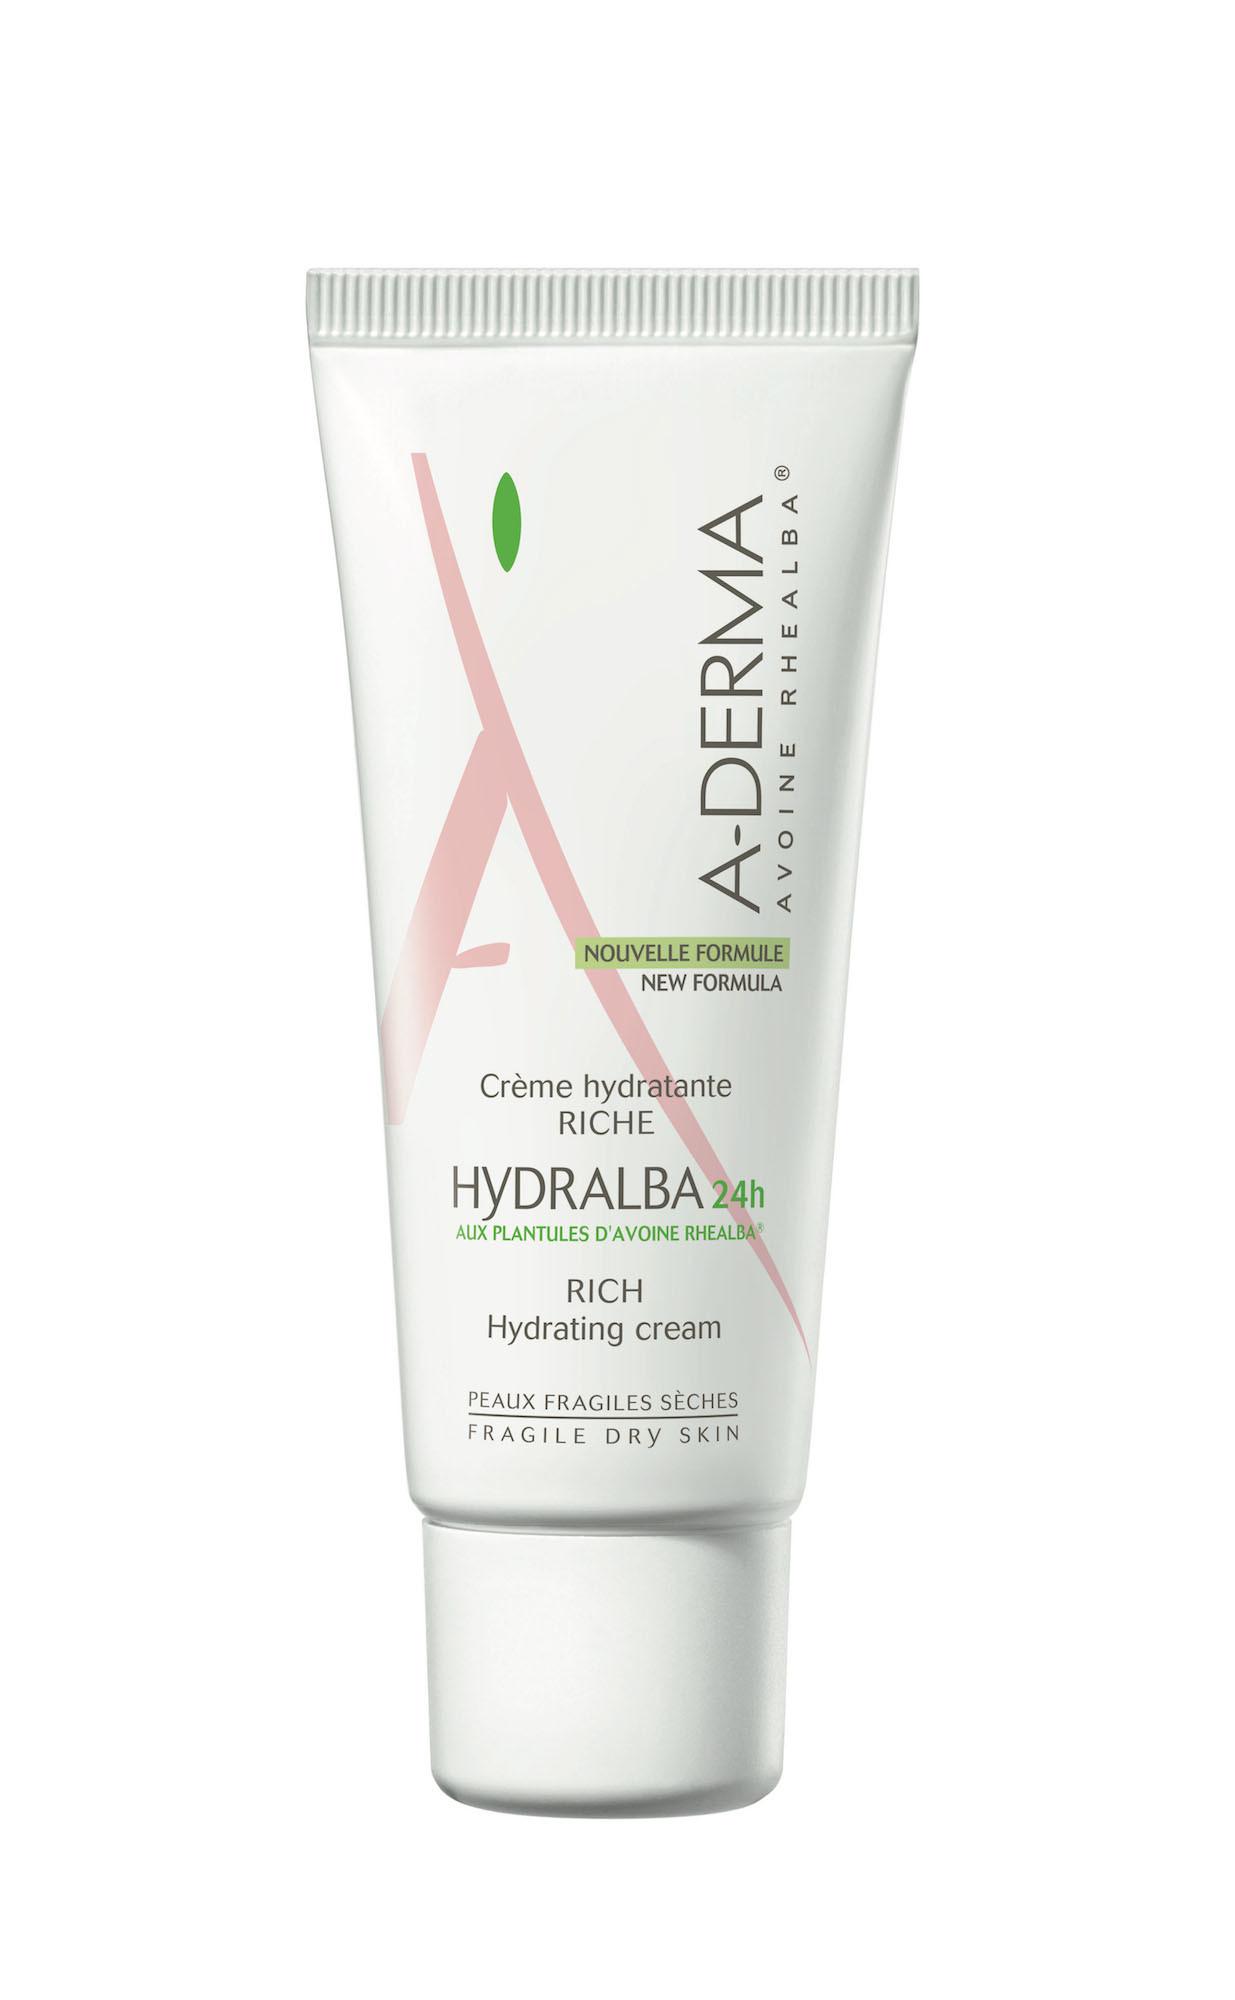 Crema hidratante rica HYDRALBA 24h de A-Derma